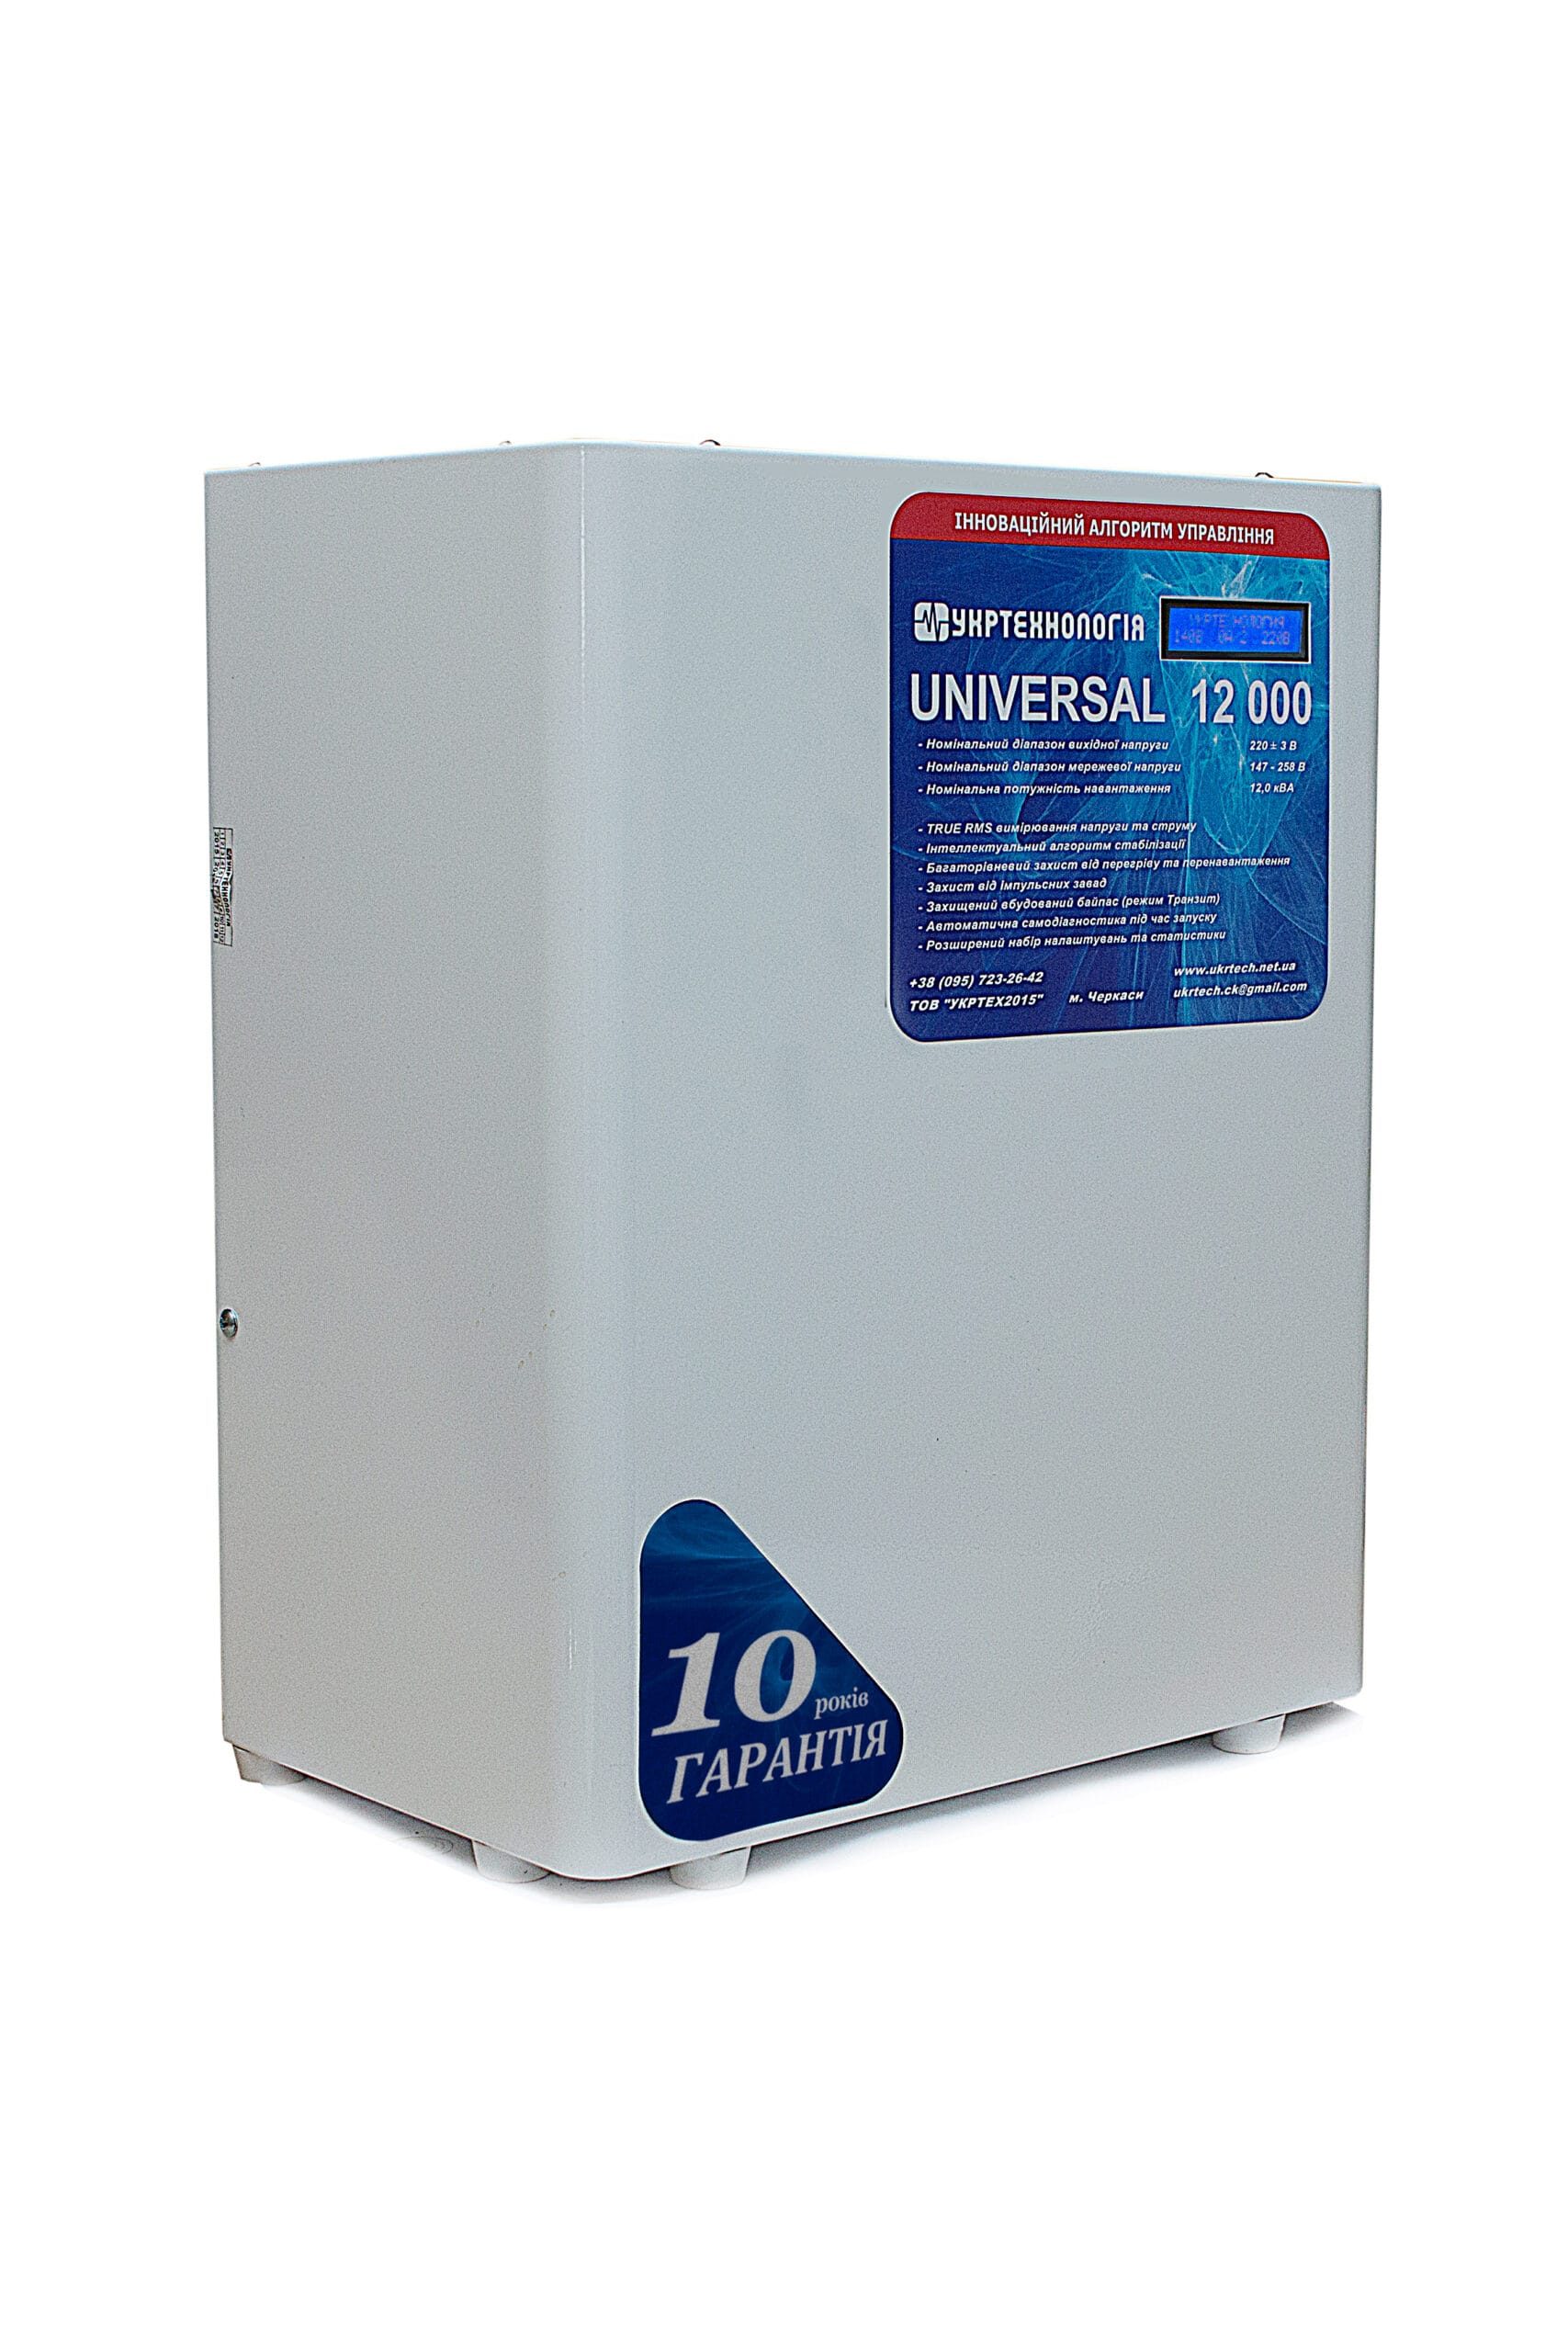 Стабилизаторы напряжения - Стабилизатор напряжения 12 кВт UNIVERSAL 000001420 - Фото 3